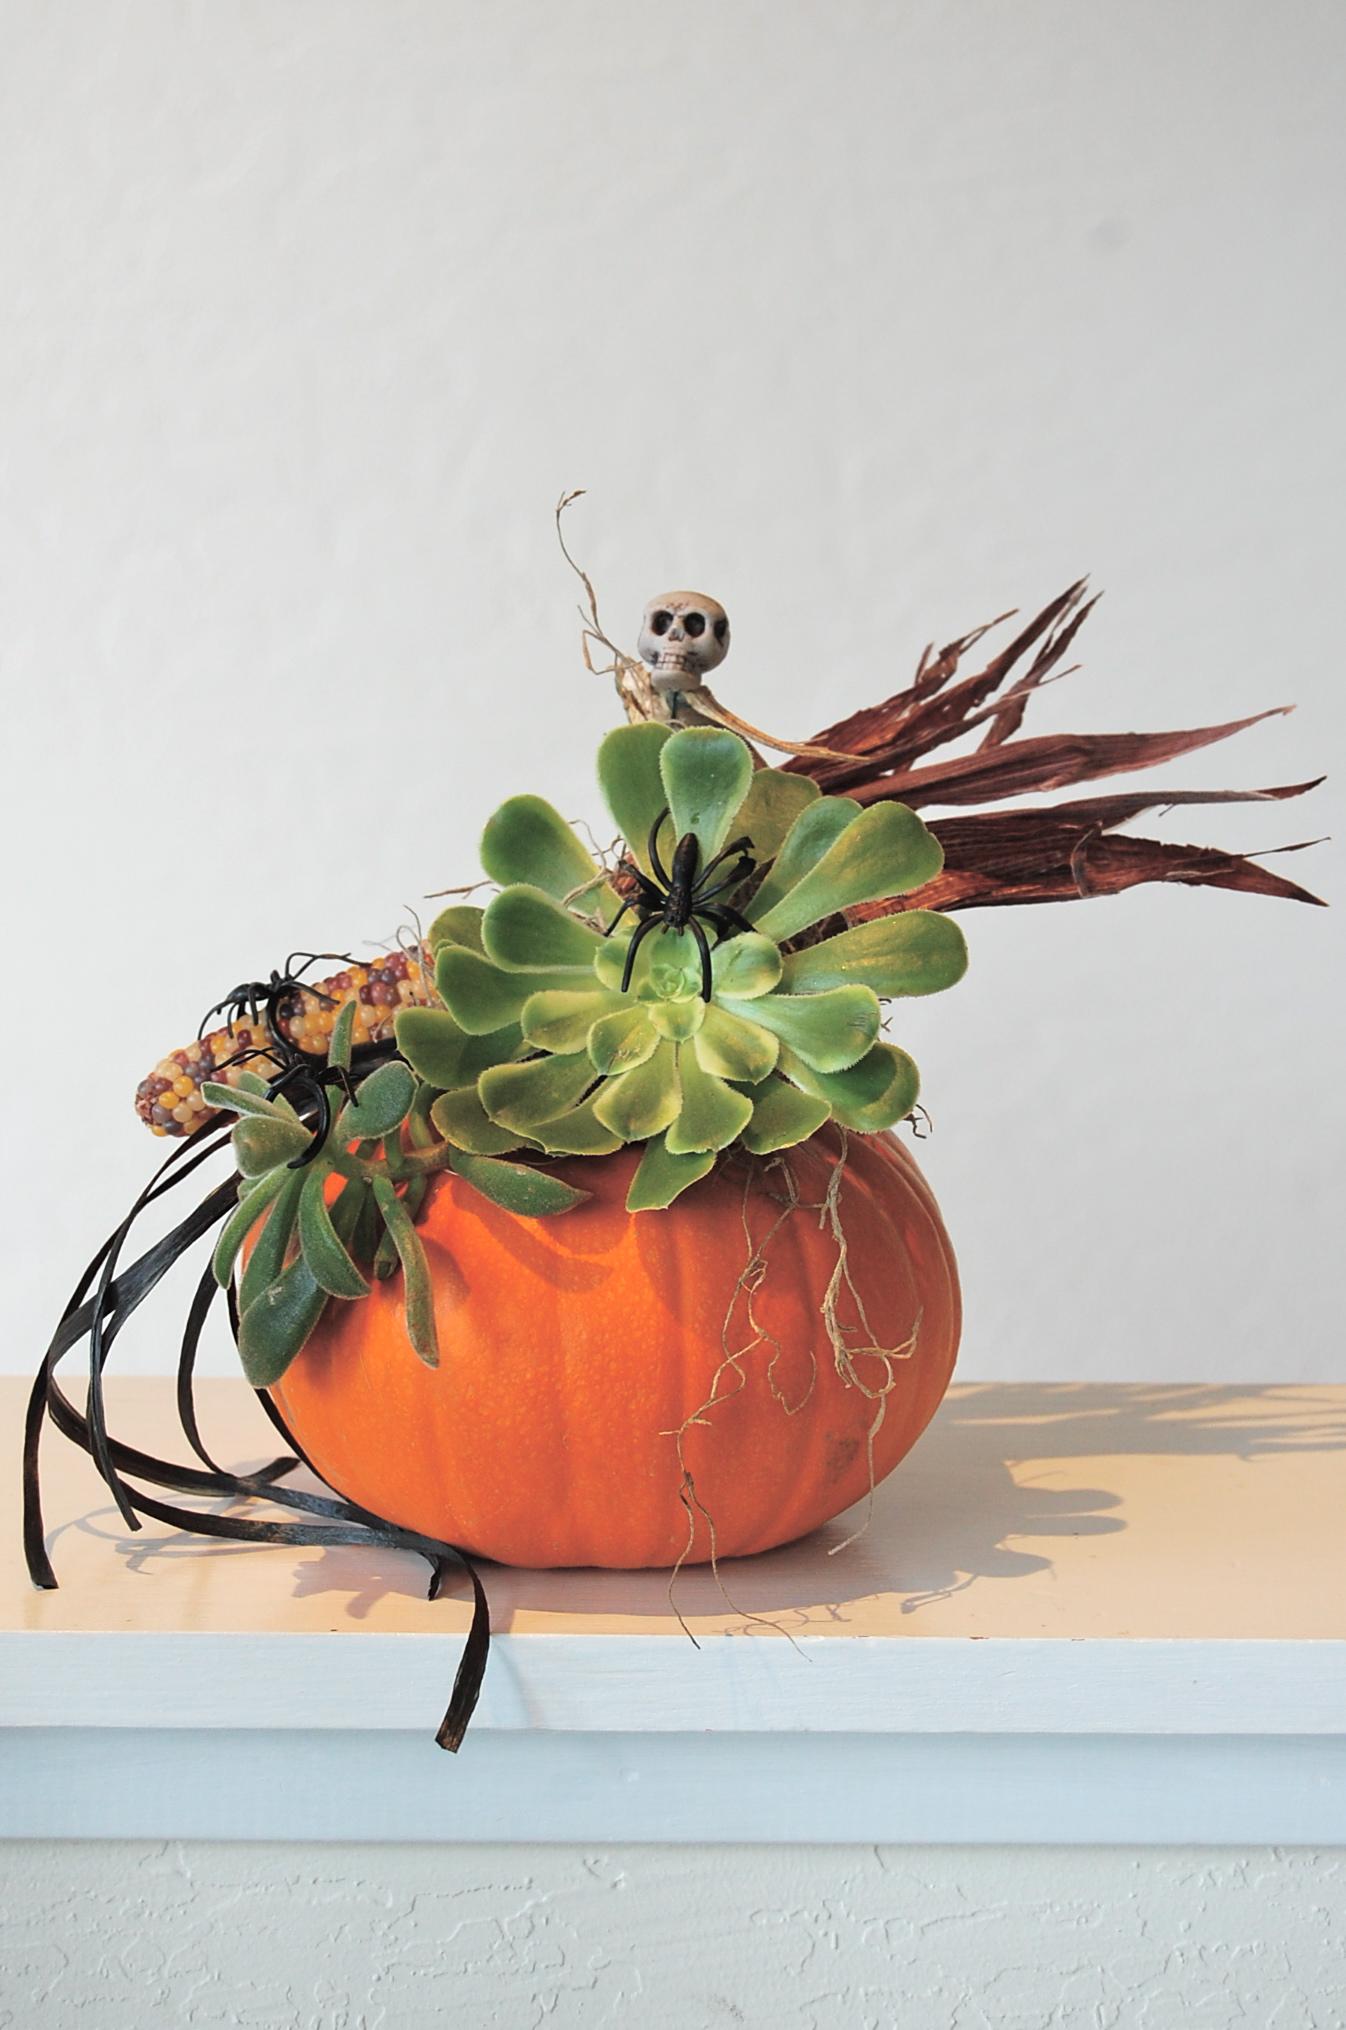 Halloween-Theme Pumpkin